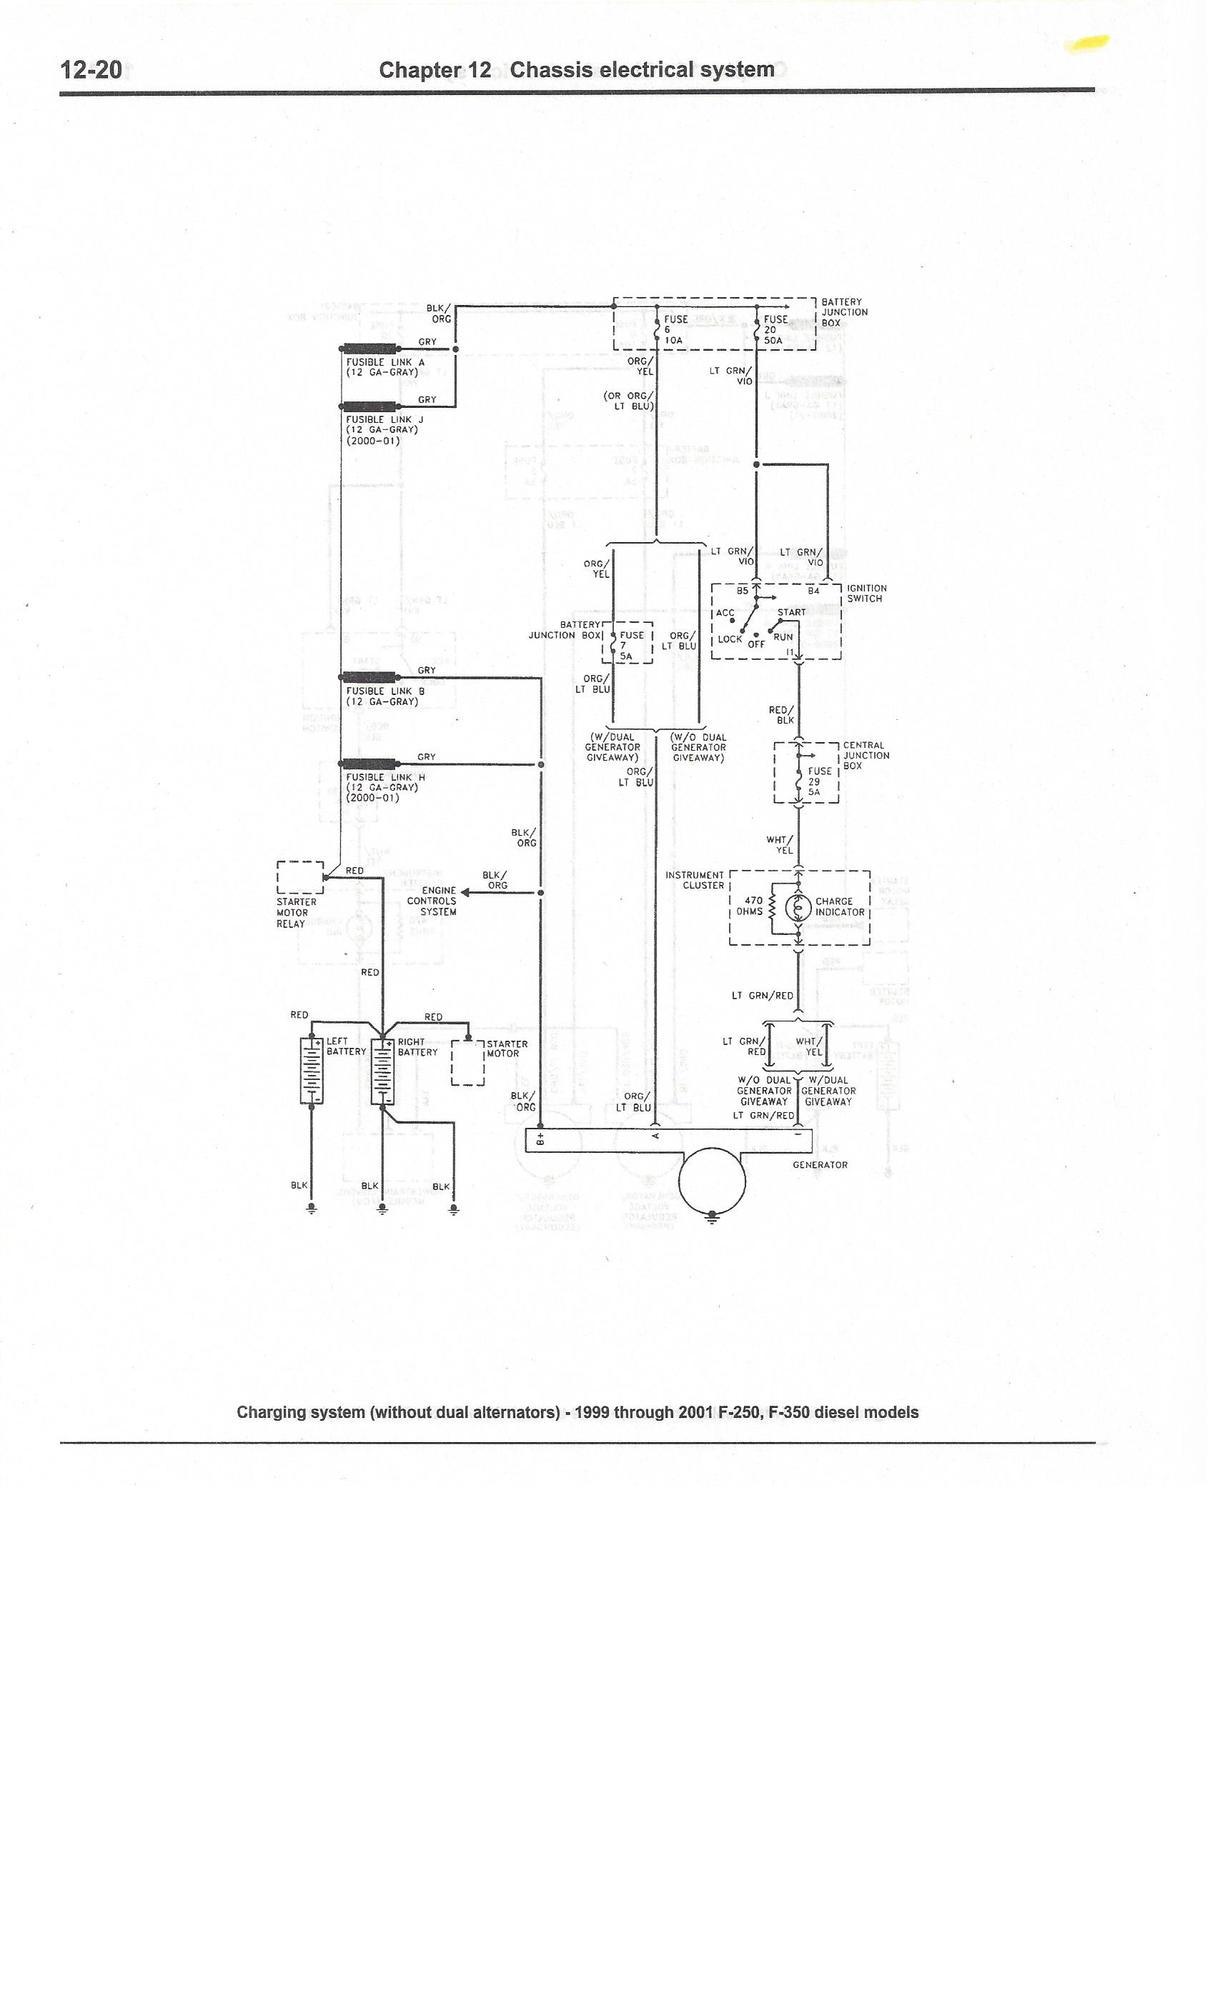 wiring diagram 2001 ford excursion diesel complete excursion wiring diagrams ... so far - ford truck ... #5